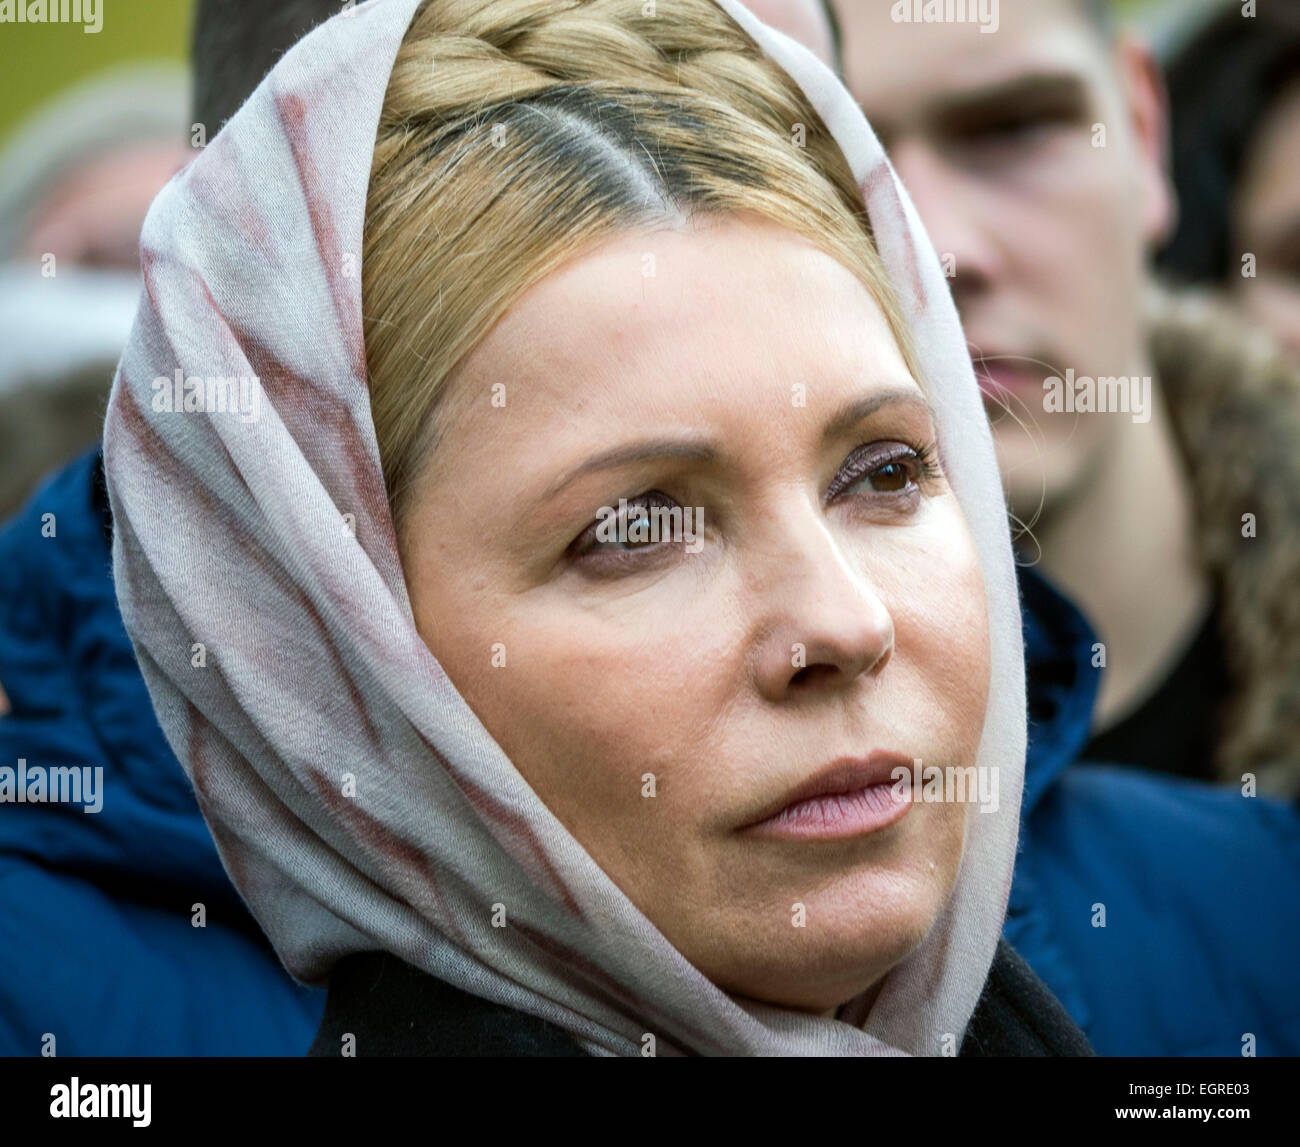 Kiev, Ukraine 1st March 2015. Yulia Timoshenko during rally. -- Activists demand the release of Ukrainian government - Stock Image